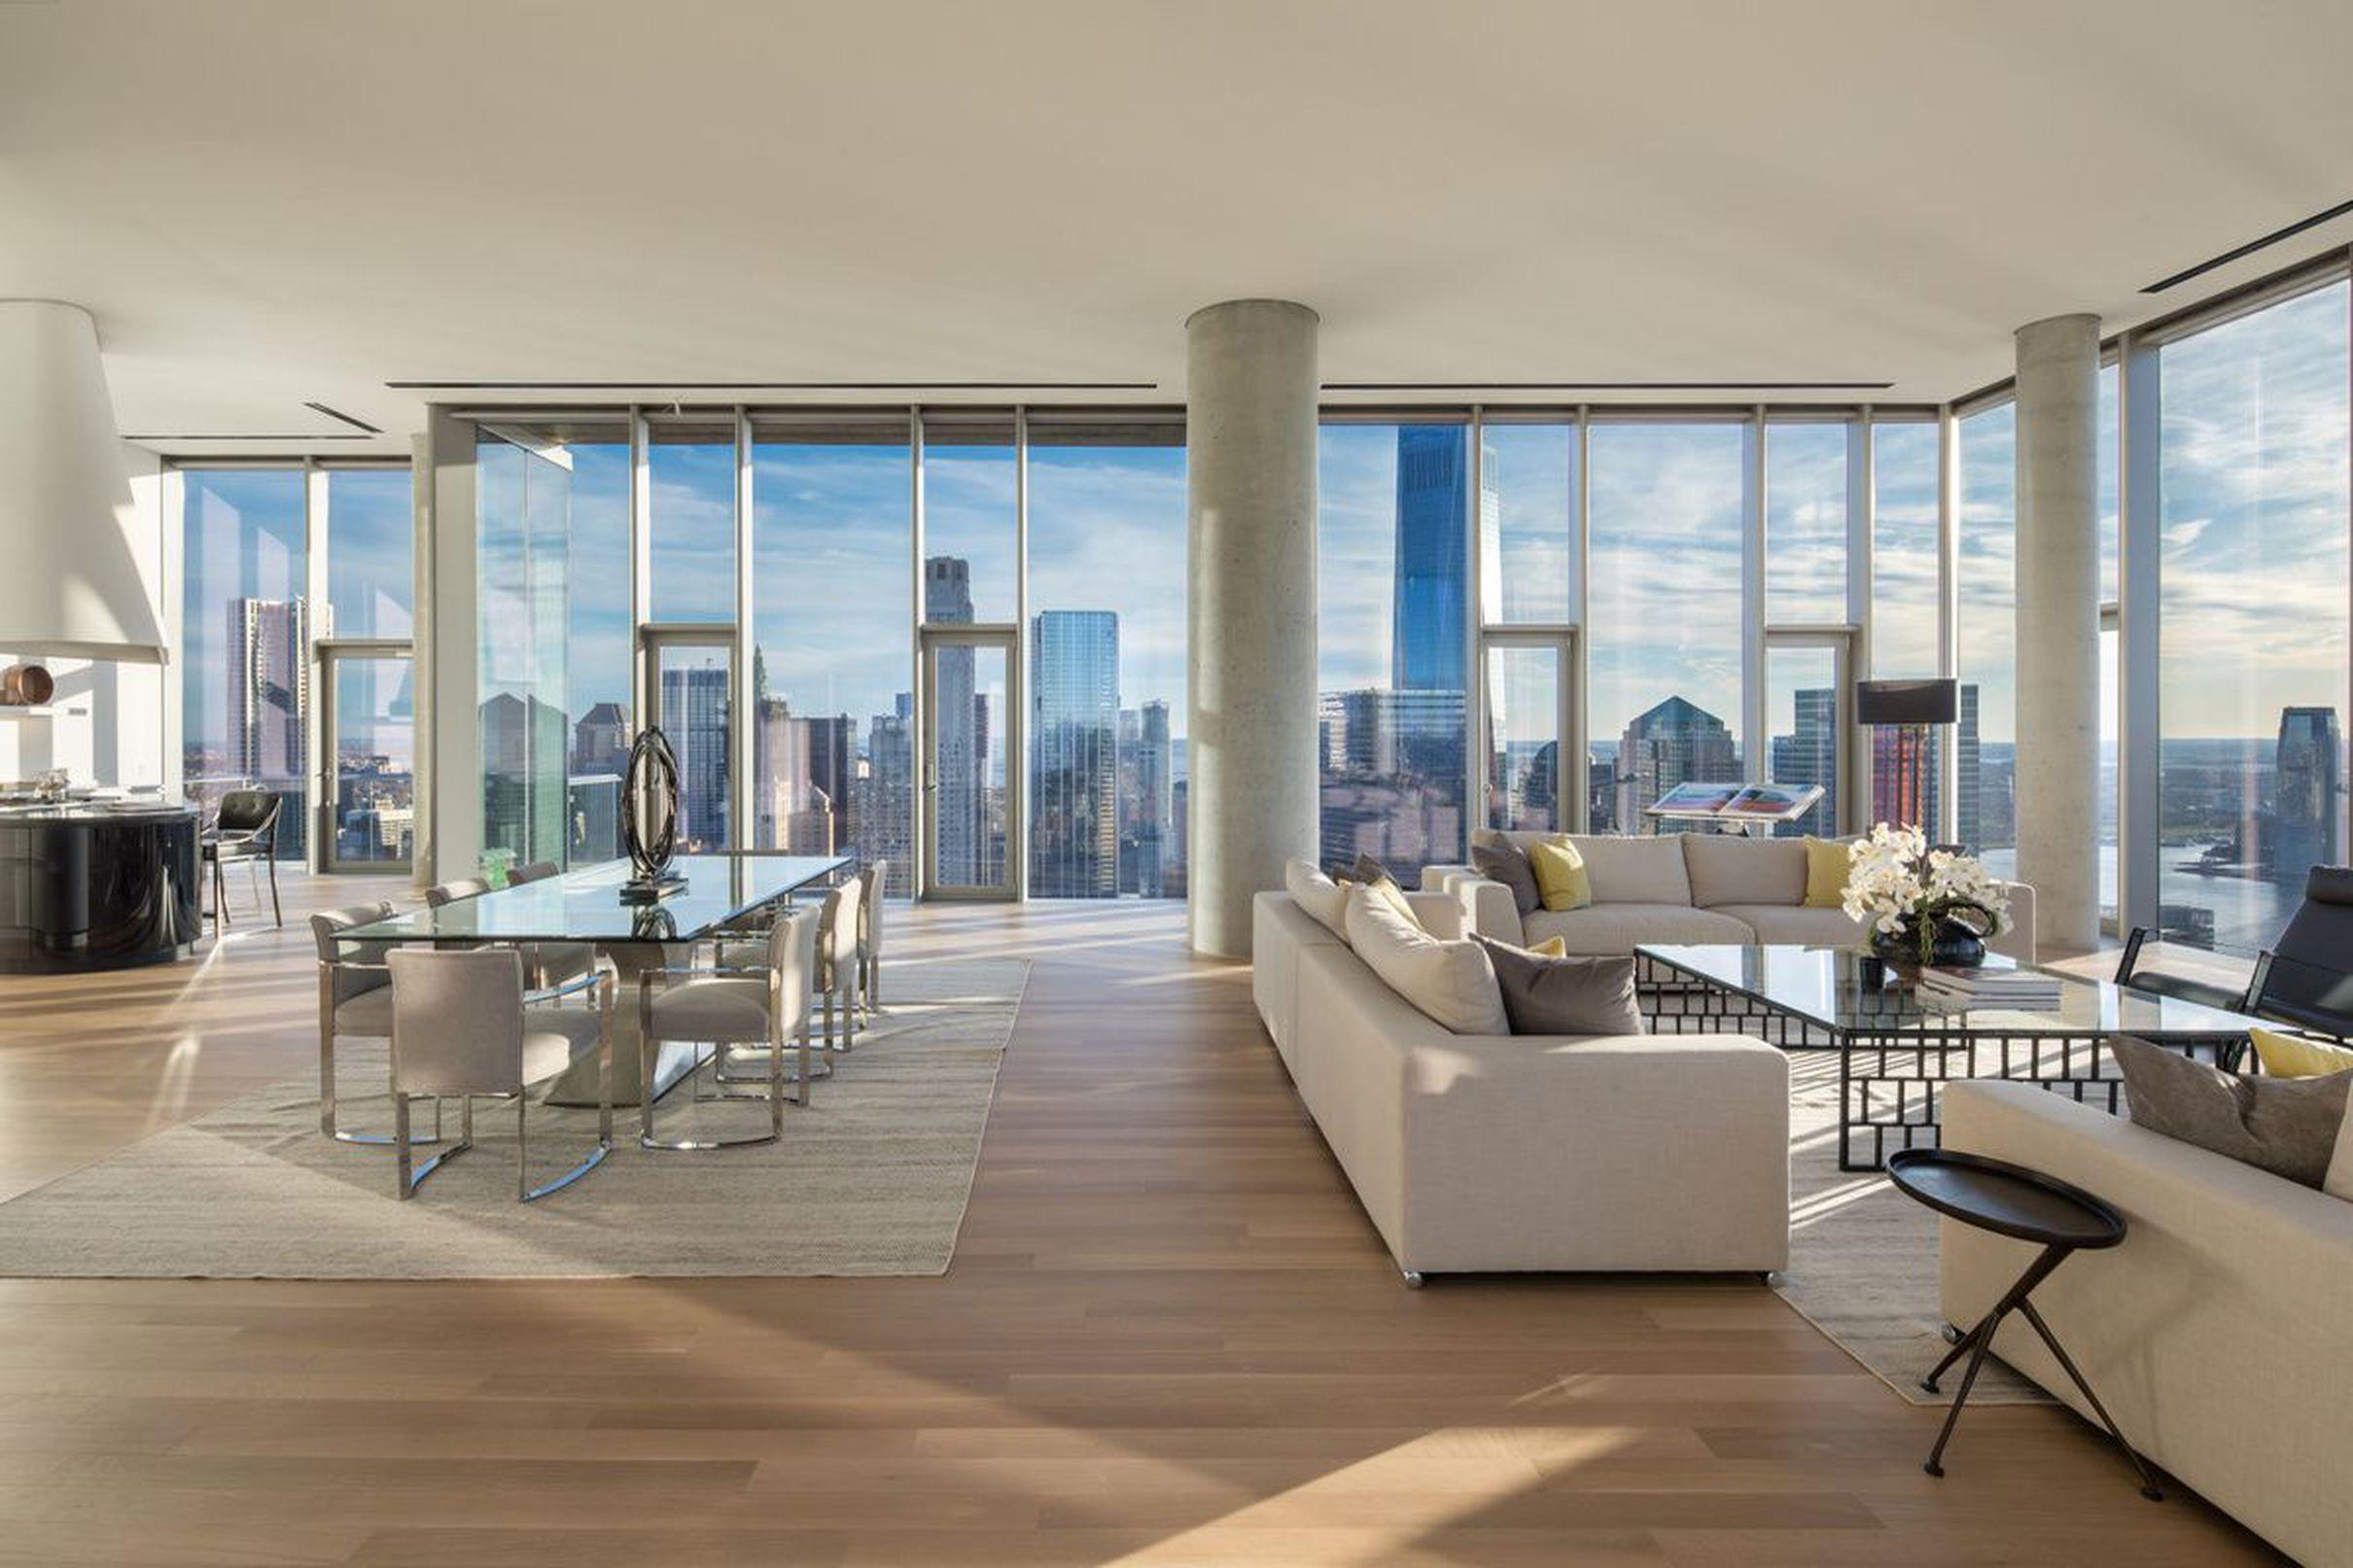 Manhattan Penthouse - Tribeca, New York City